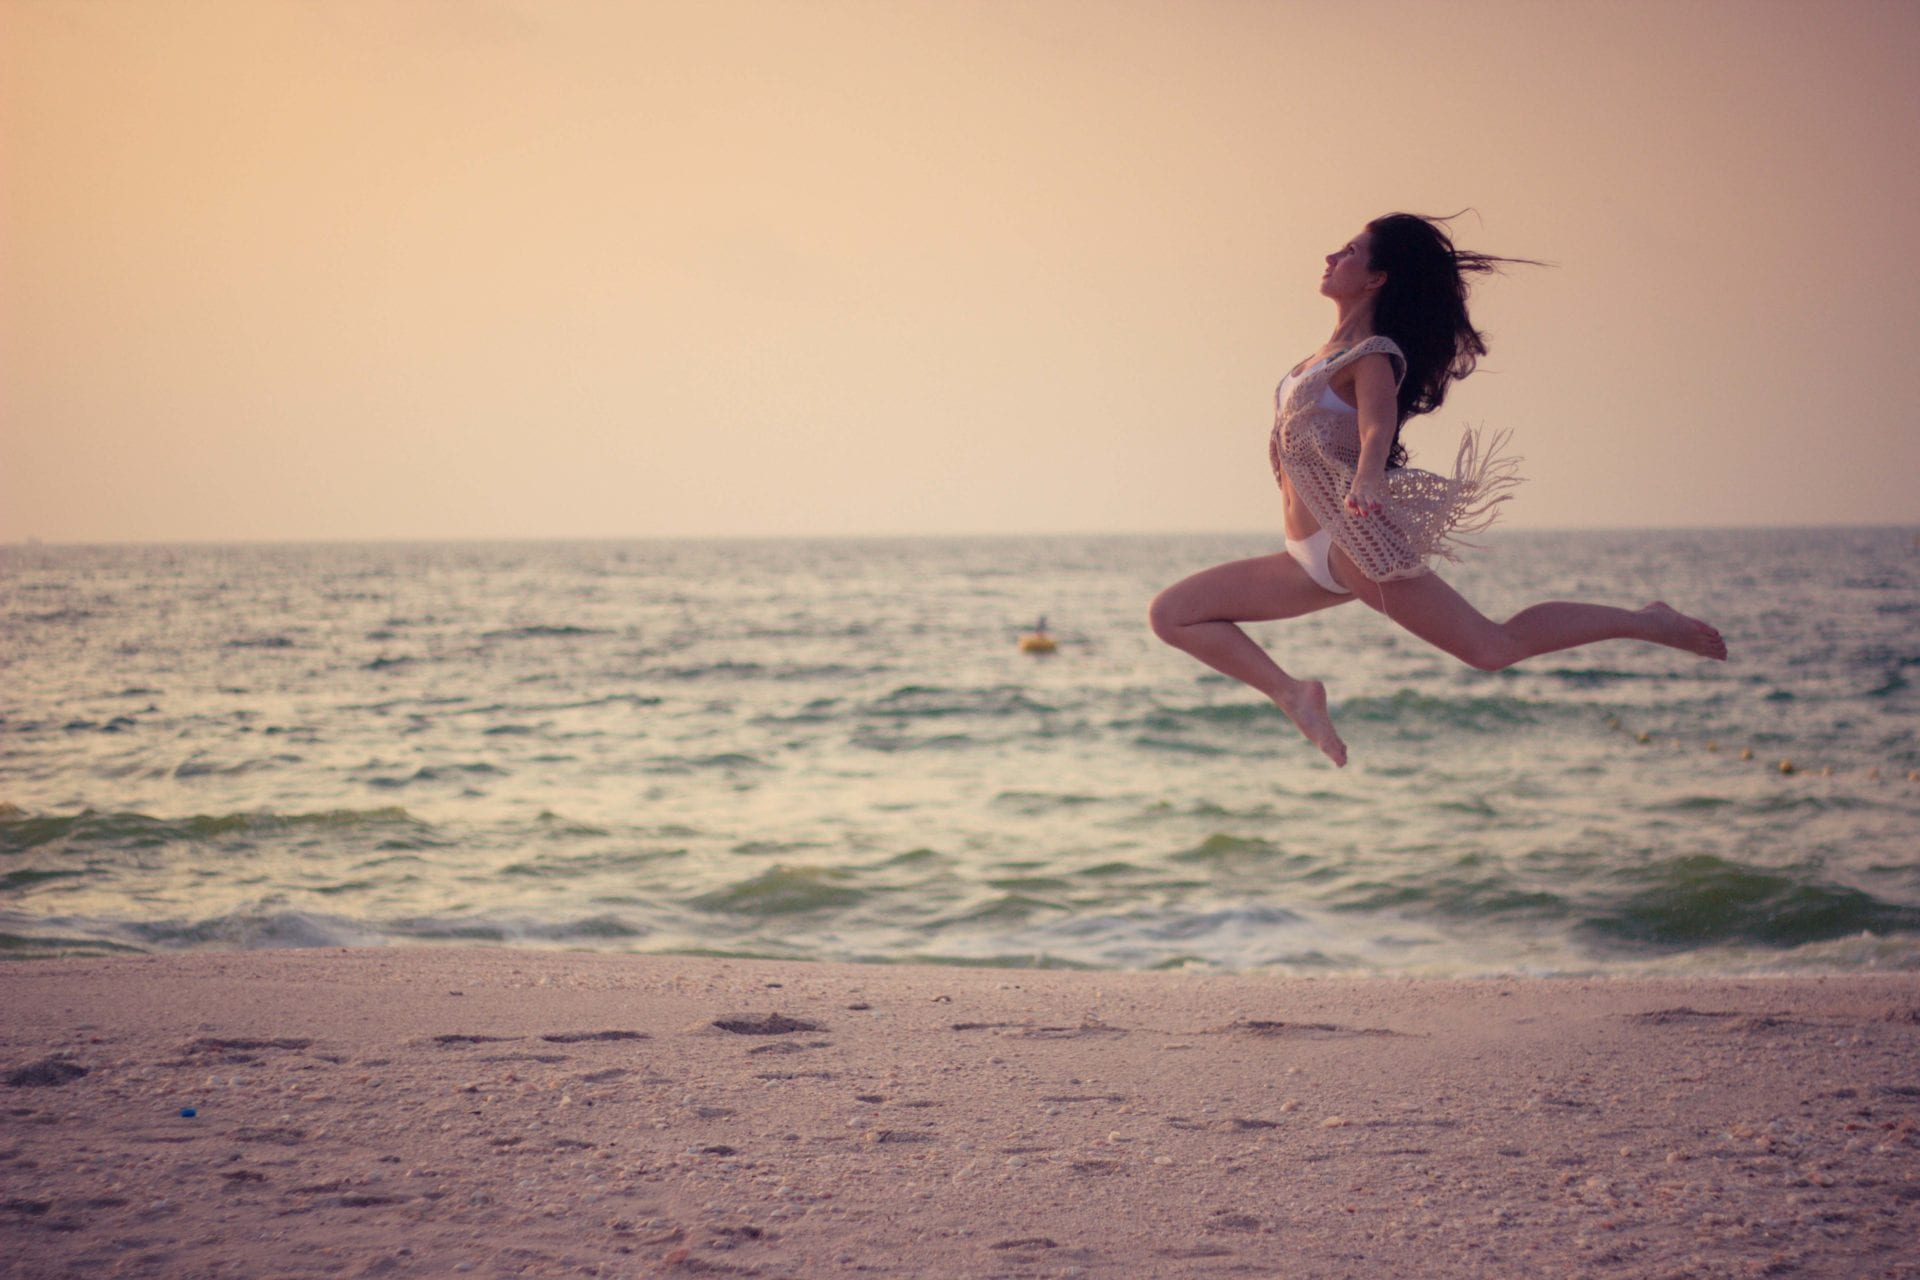 Jogínka s dlouhými vlasy ve skoku na pláži v Dubaji, jóga Liberec a Turnov, ceník jogy v Libereci a Turnově